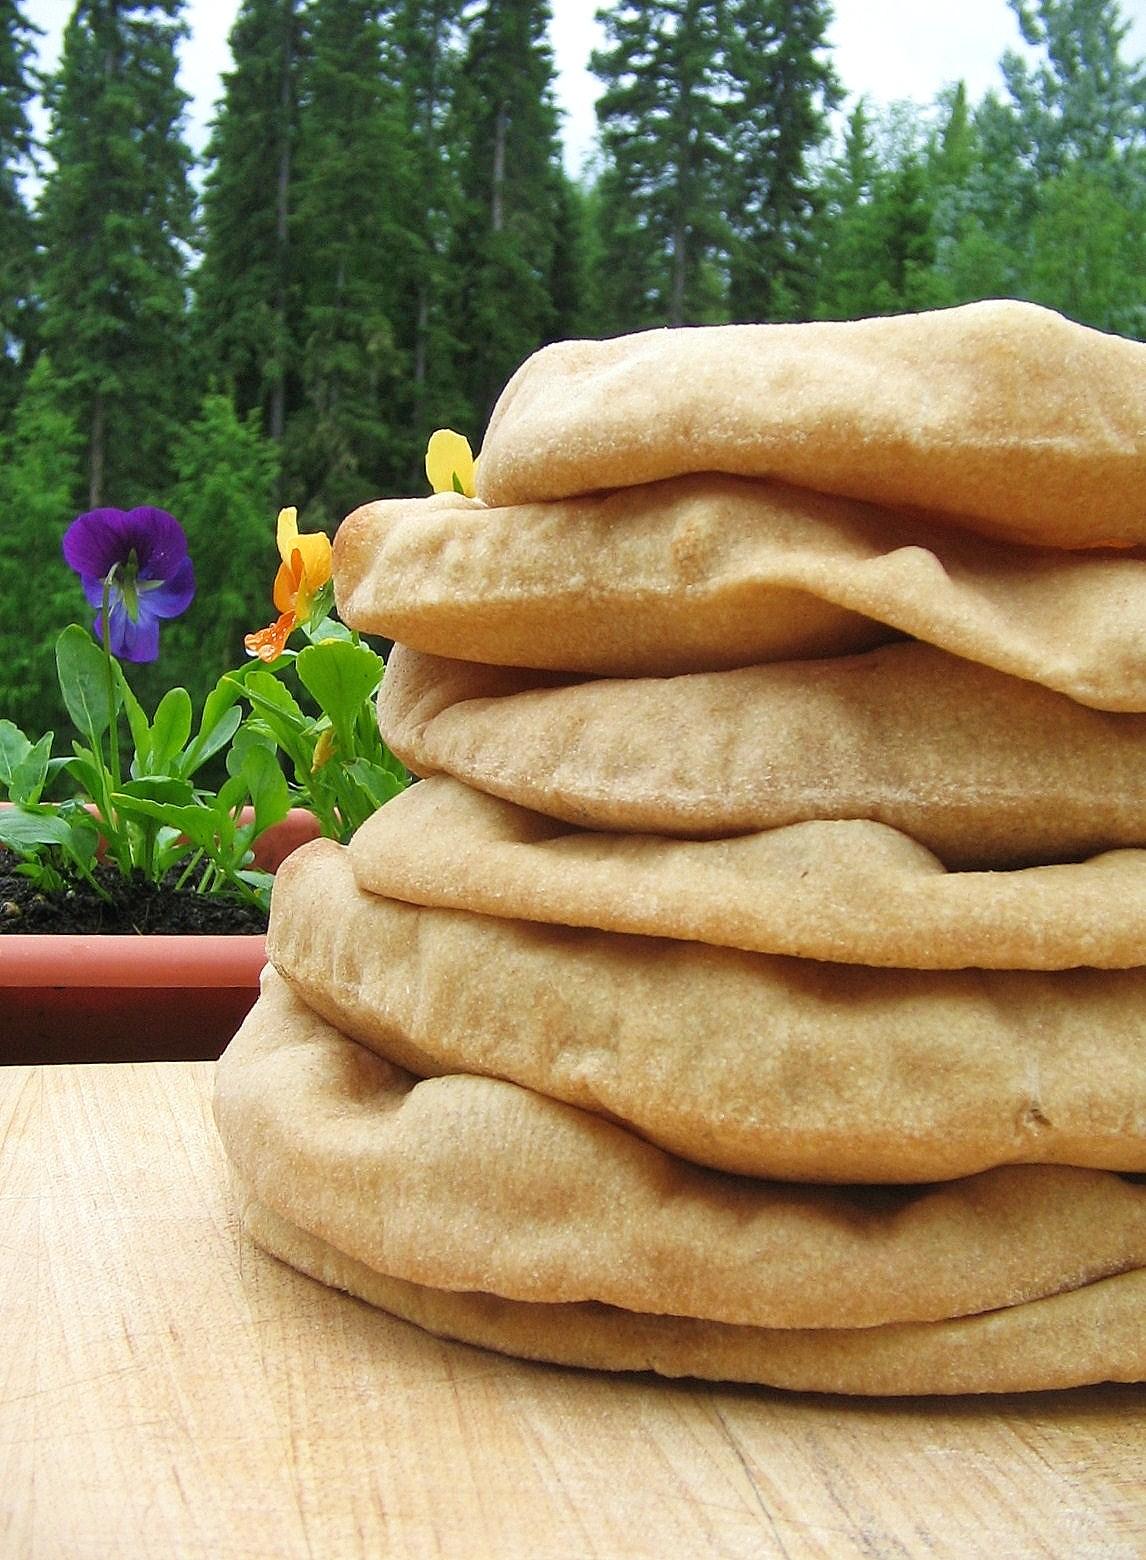 Arctic Garden Studio: Pita Bread